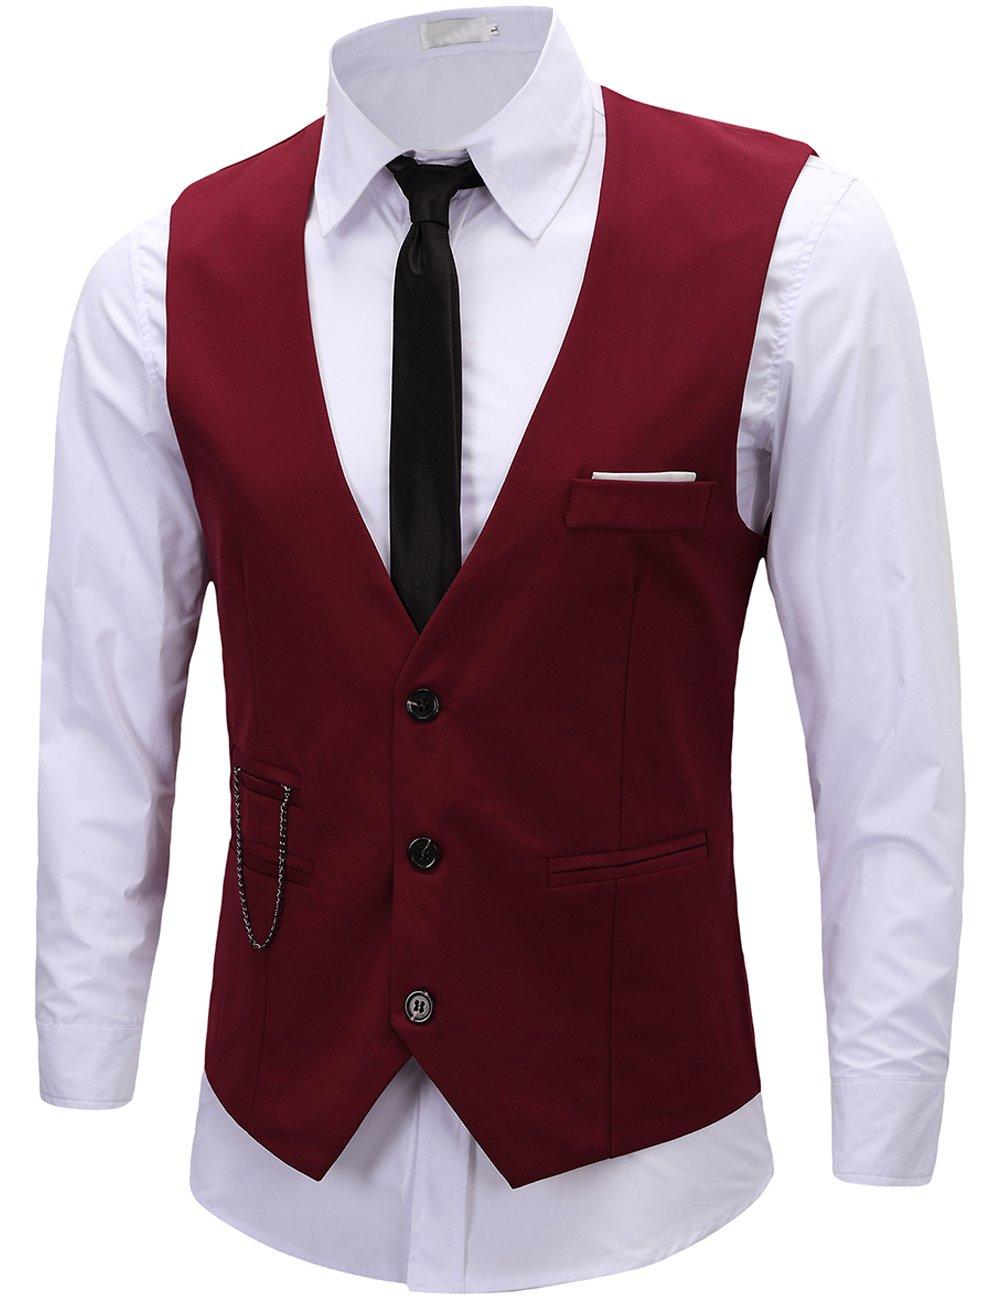 DOKKIA Men's Formal Dress Business Slim Fit Sleeveless Jacket Waistcoat Vest (Medium, Burgundy)